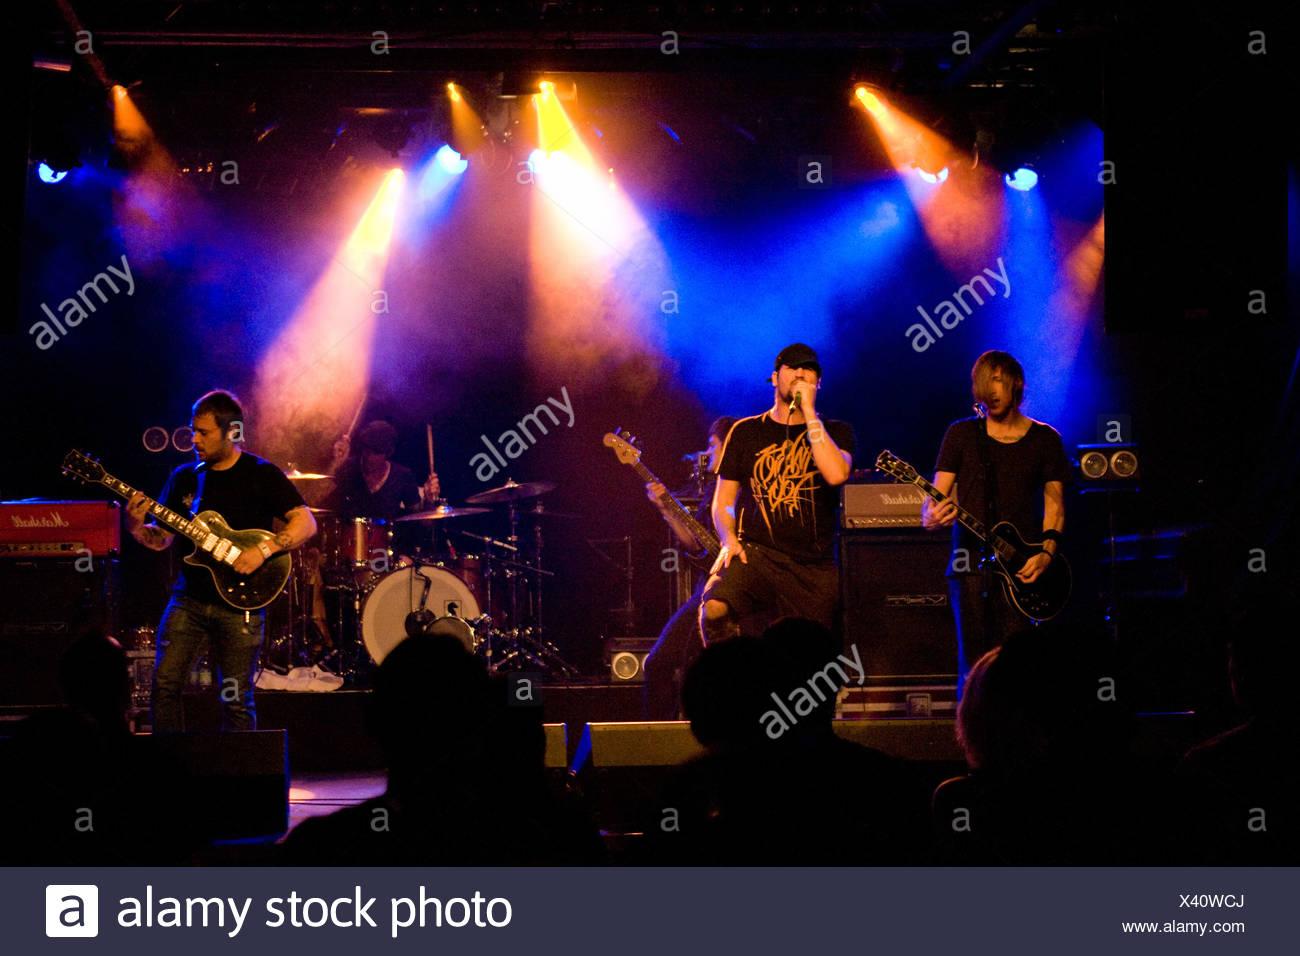 Metalcore hardcore bands